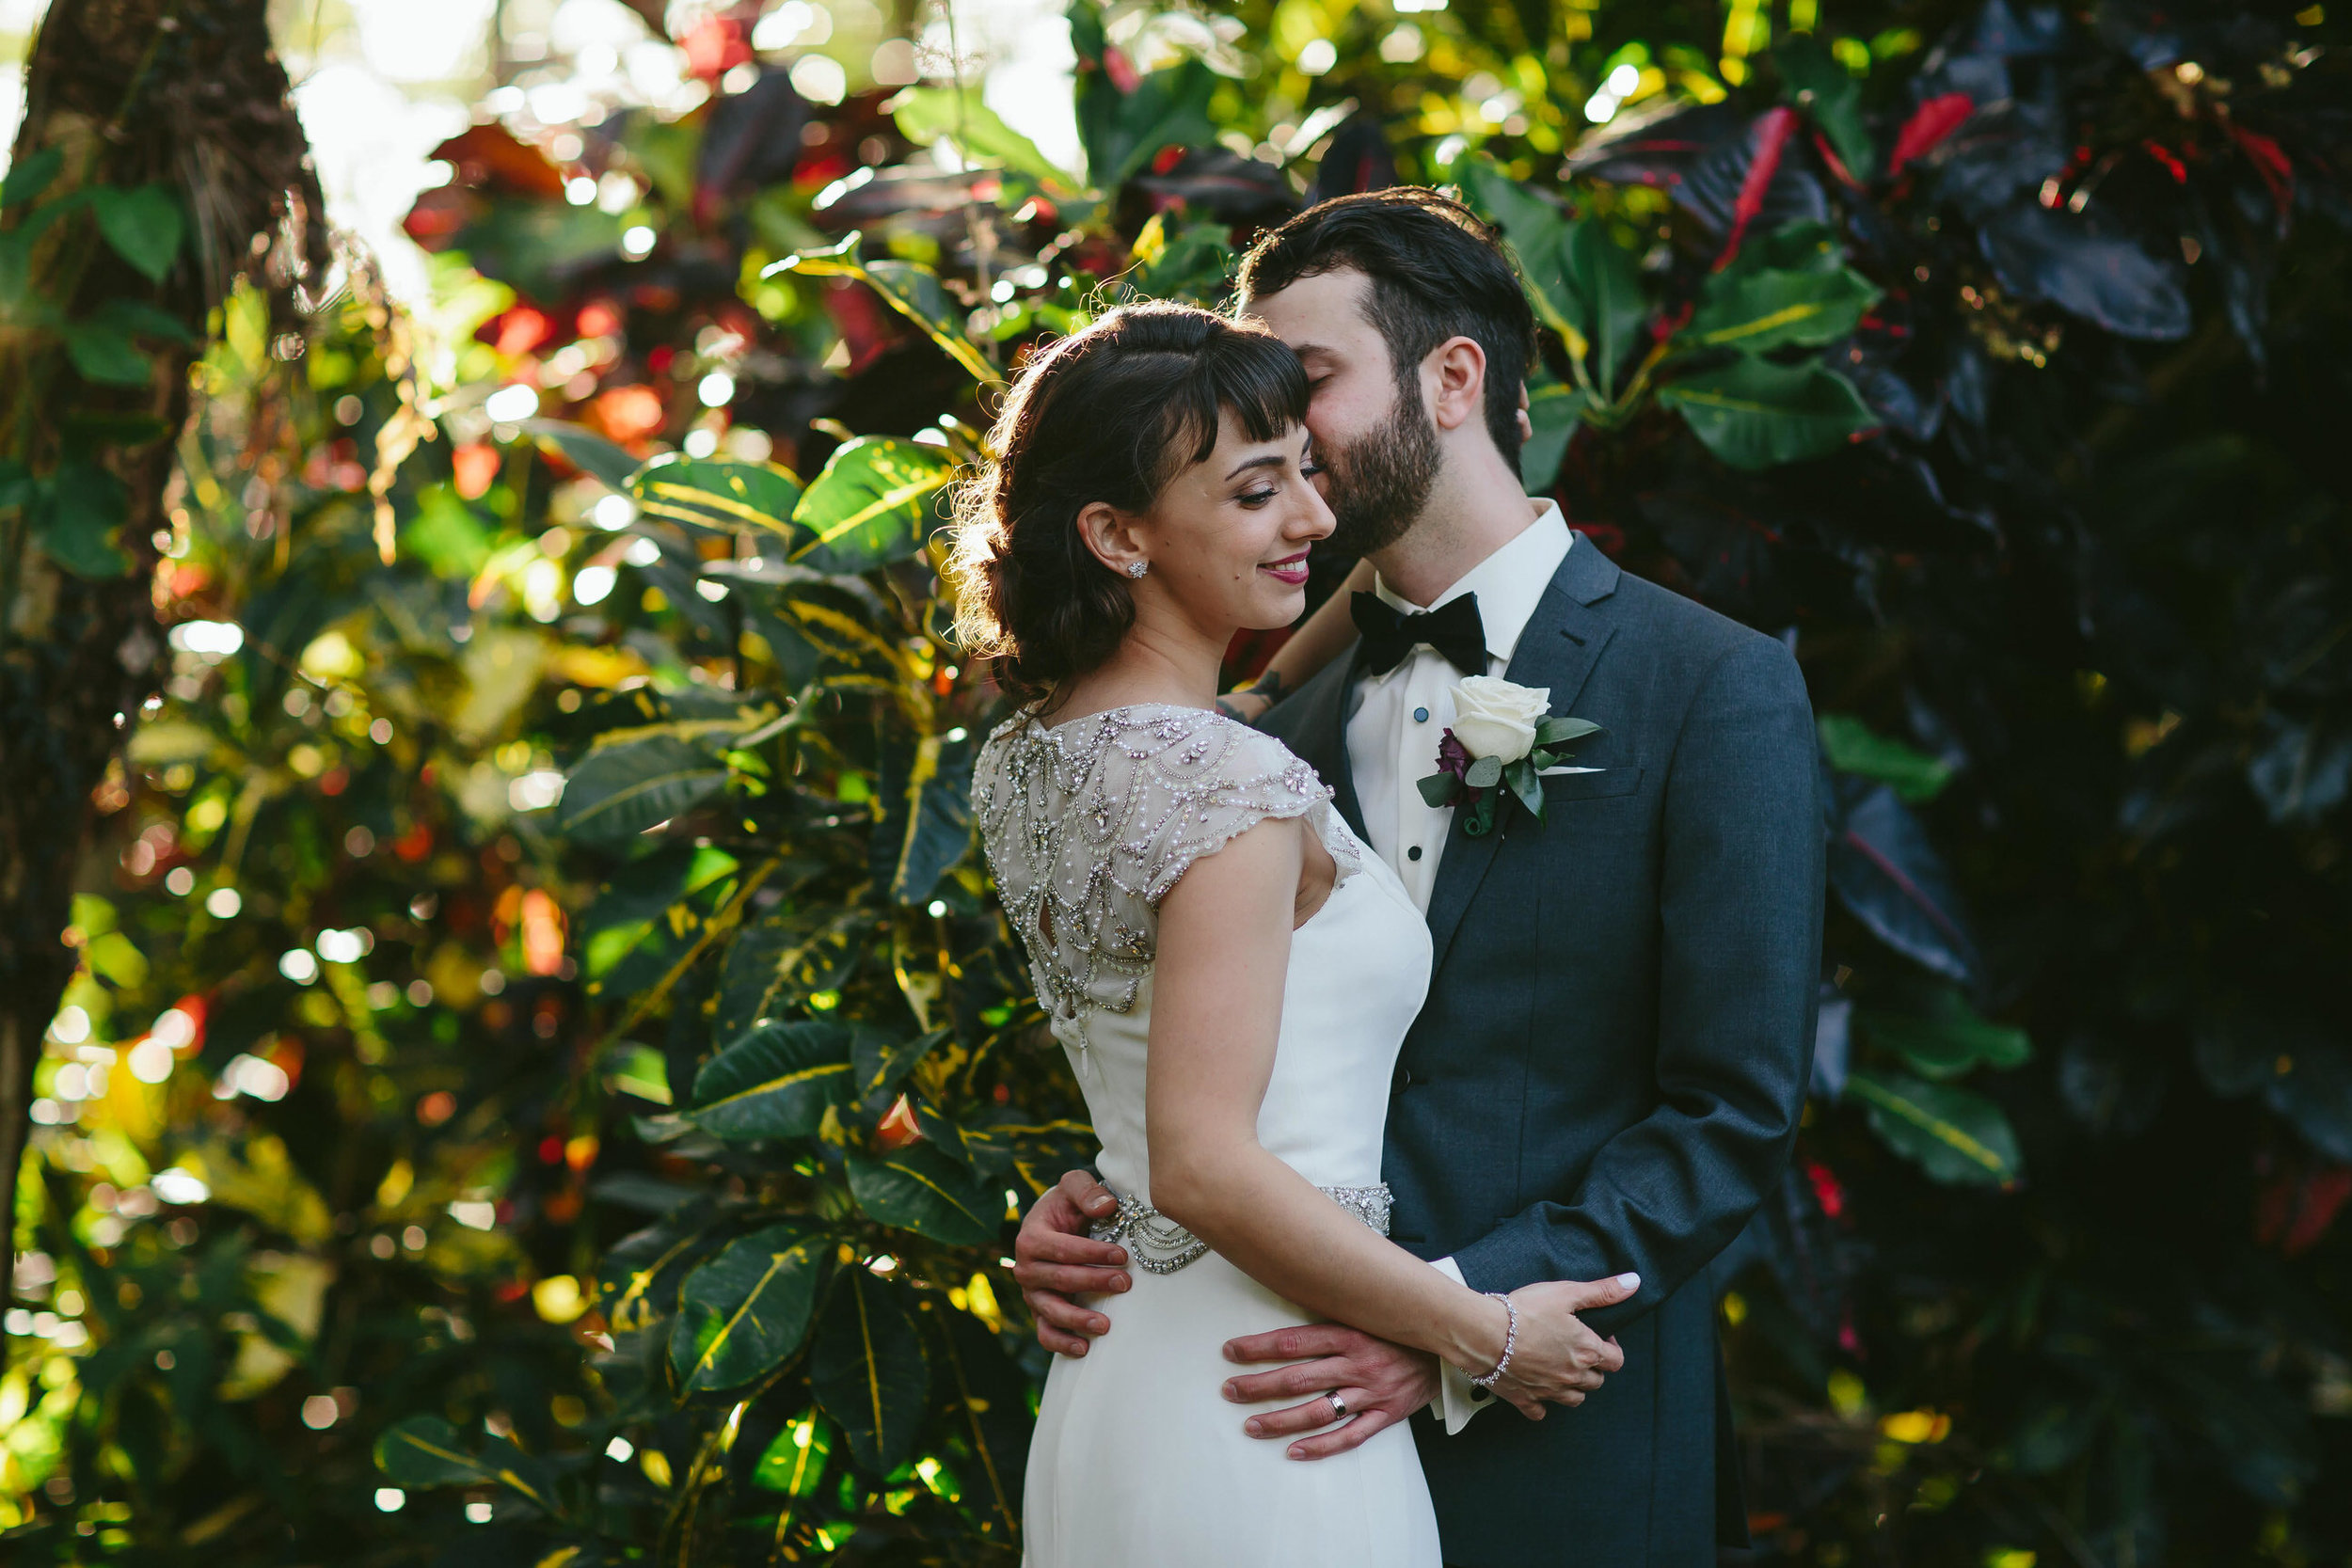 tiny-house-photo-gorgeous-wedding-portraits.jpg